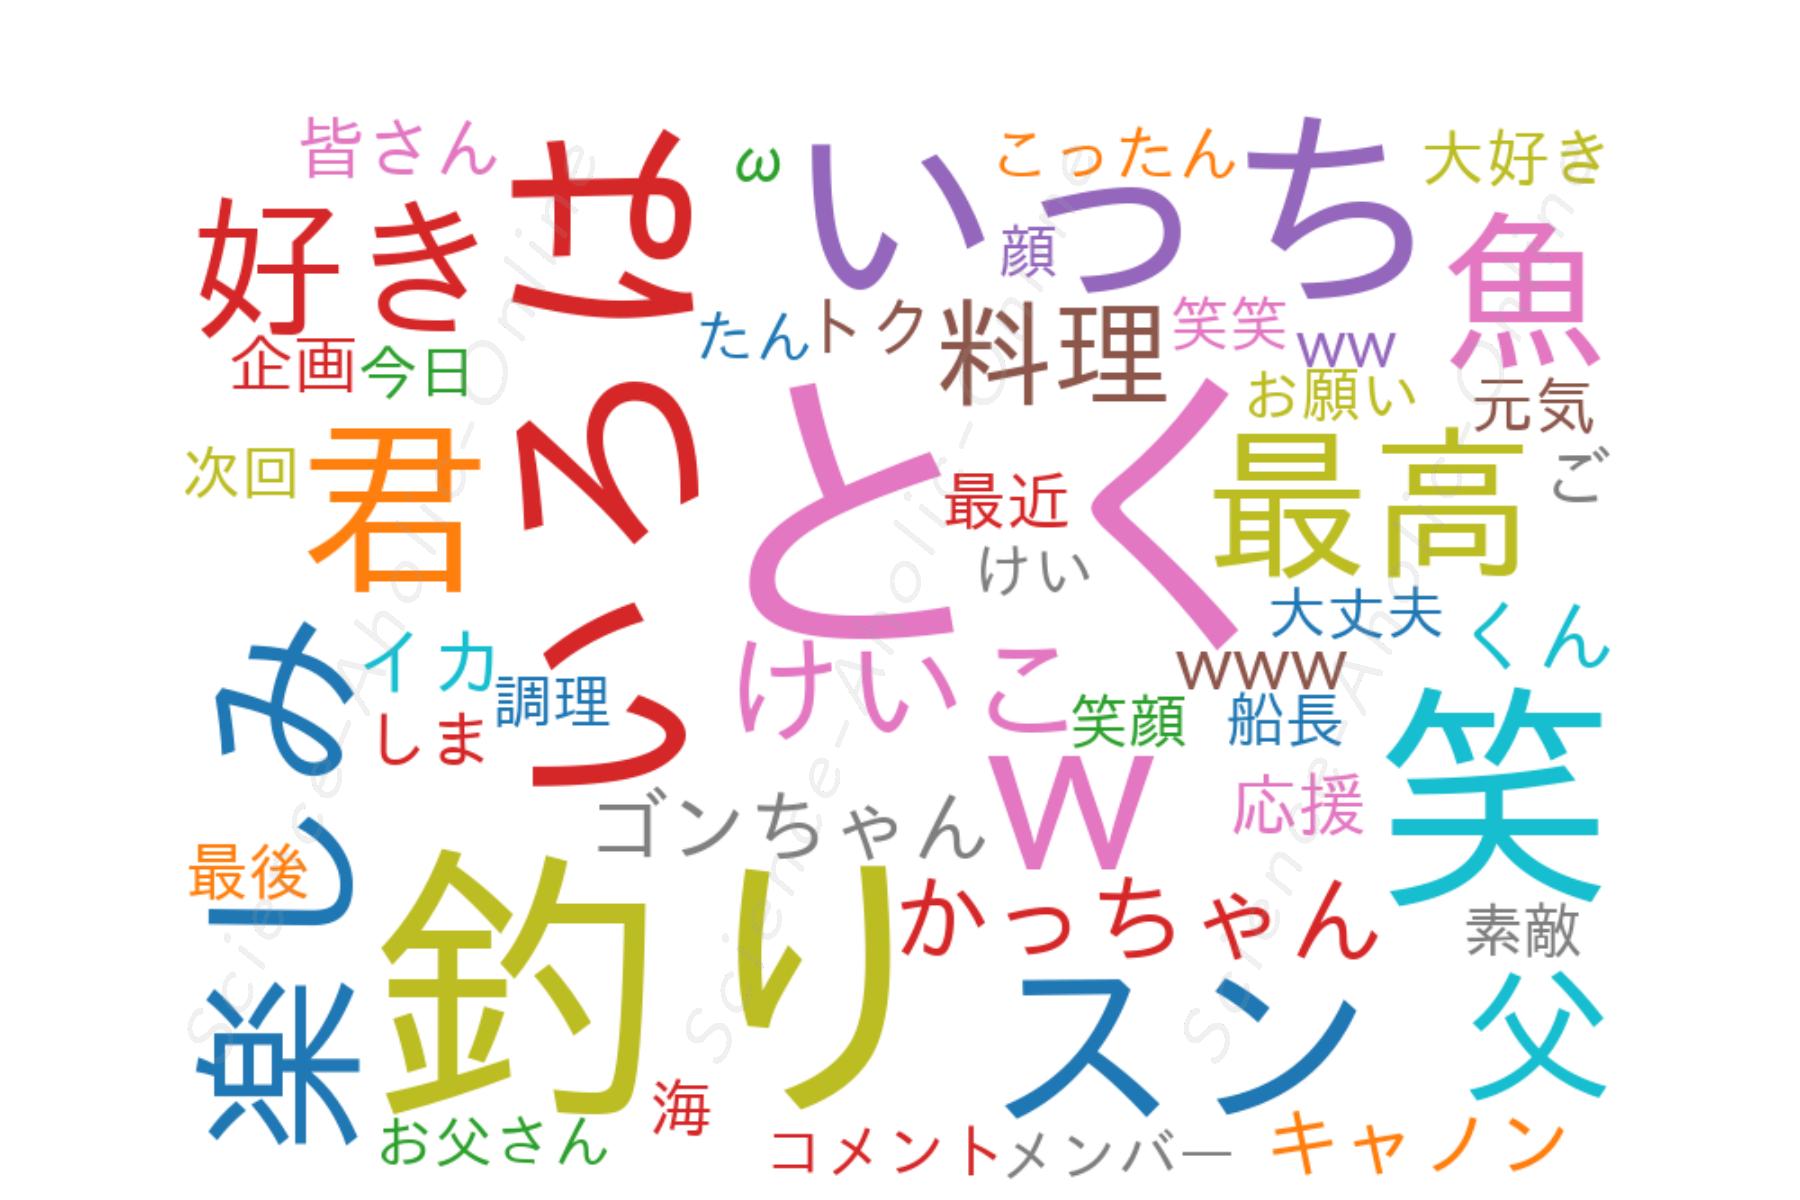 https://science-aholic-online.com/wp-content/uploads/2020/08/wordcloud_釣りいろは.png